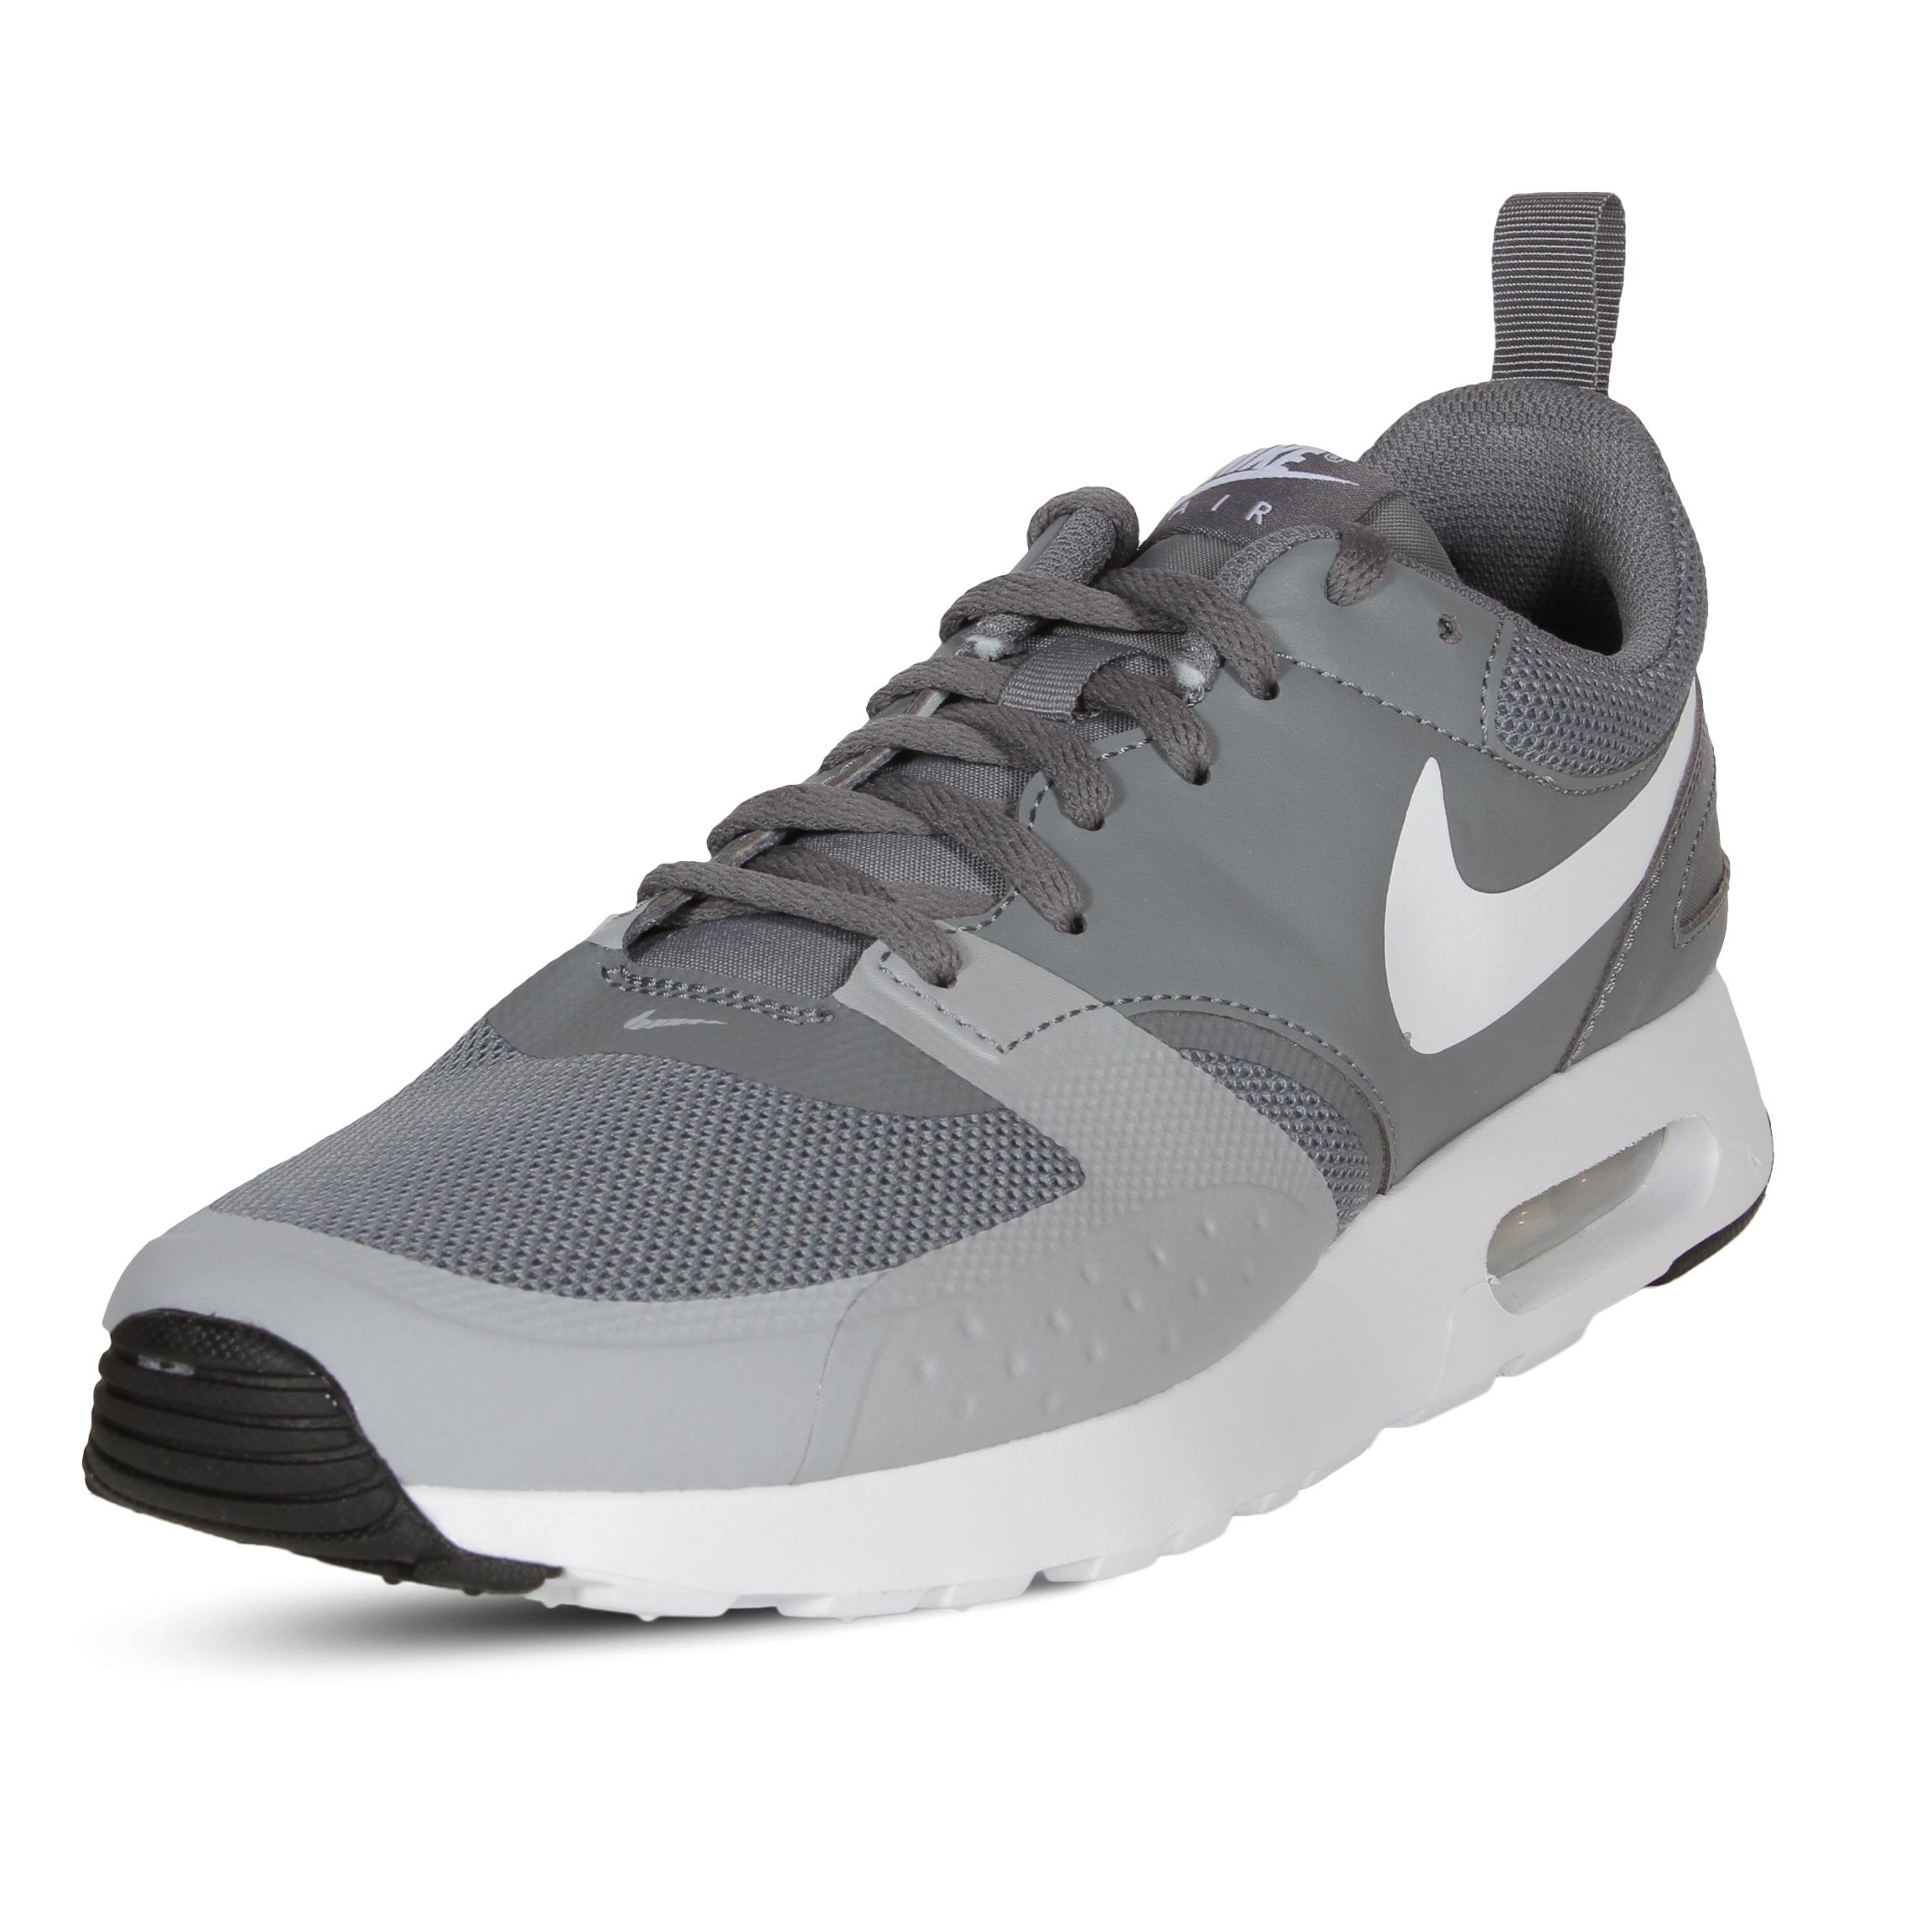 Los Running Hombres De Nike Air Max Vision Running Los Zapatos 918230 006 Ebay 77614a